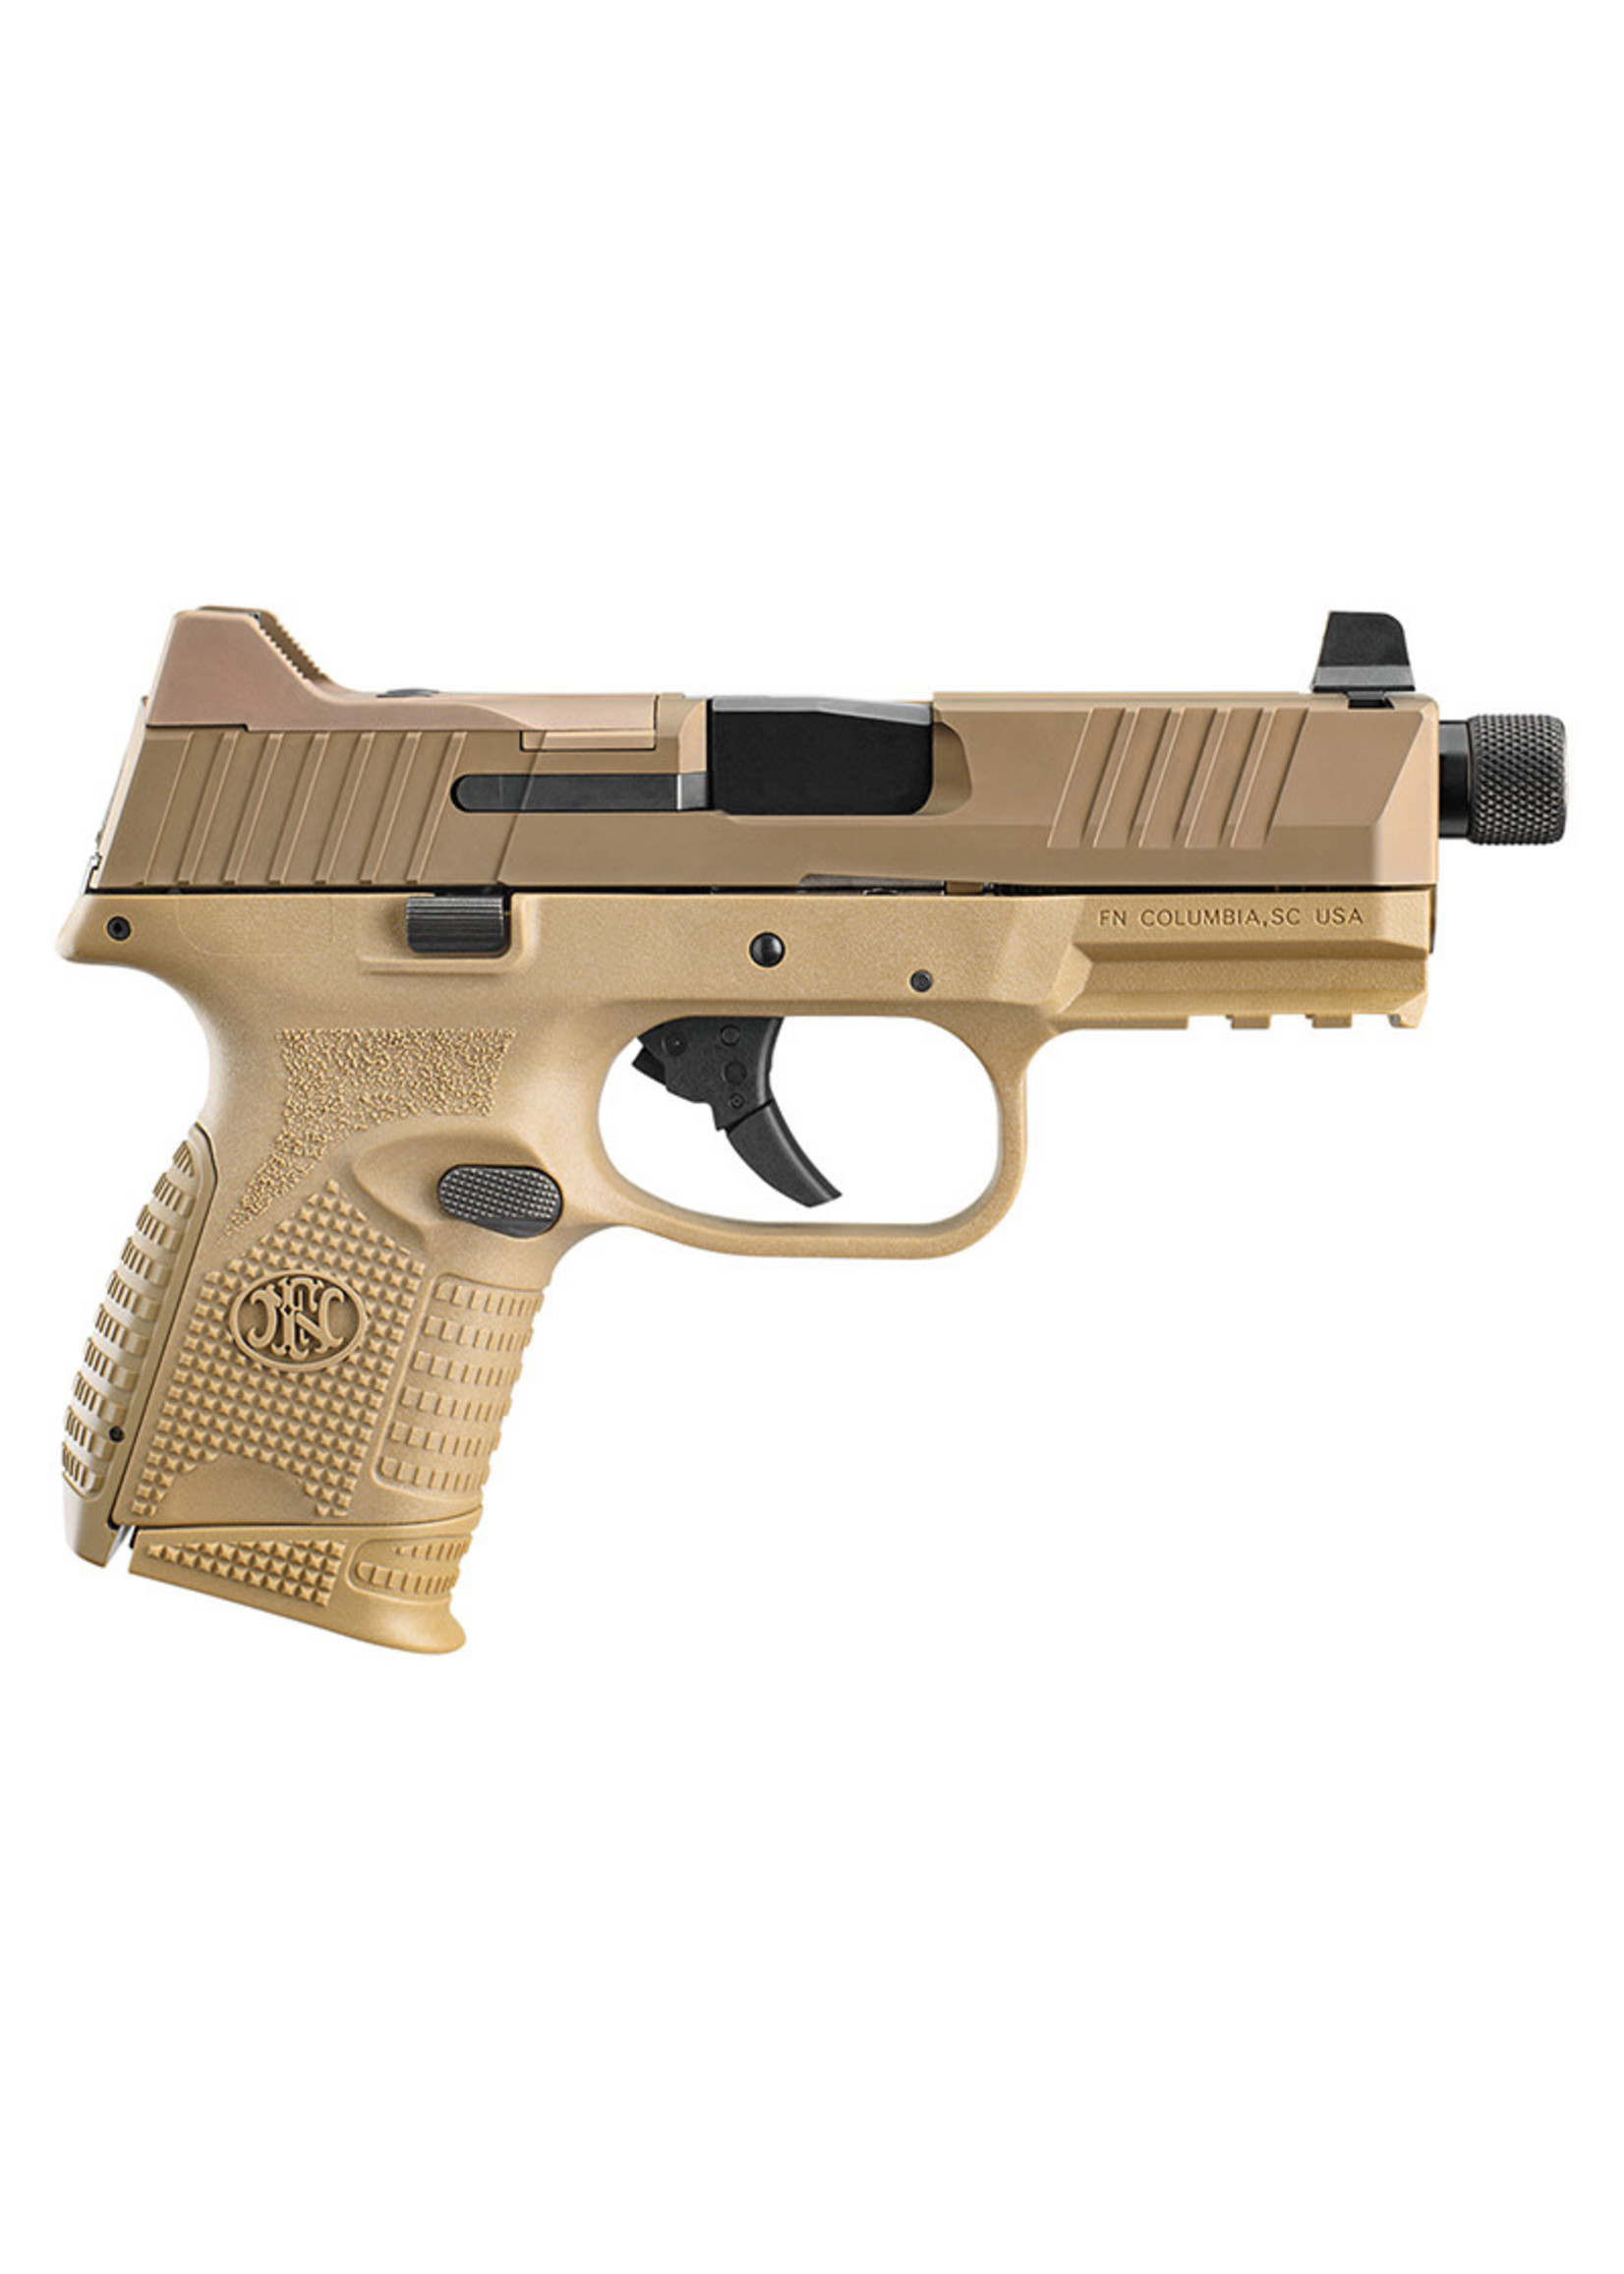 "FN FN 509 Compact Tactical, 4.32"" barrel, Optics Mounting System, FDE"